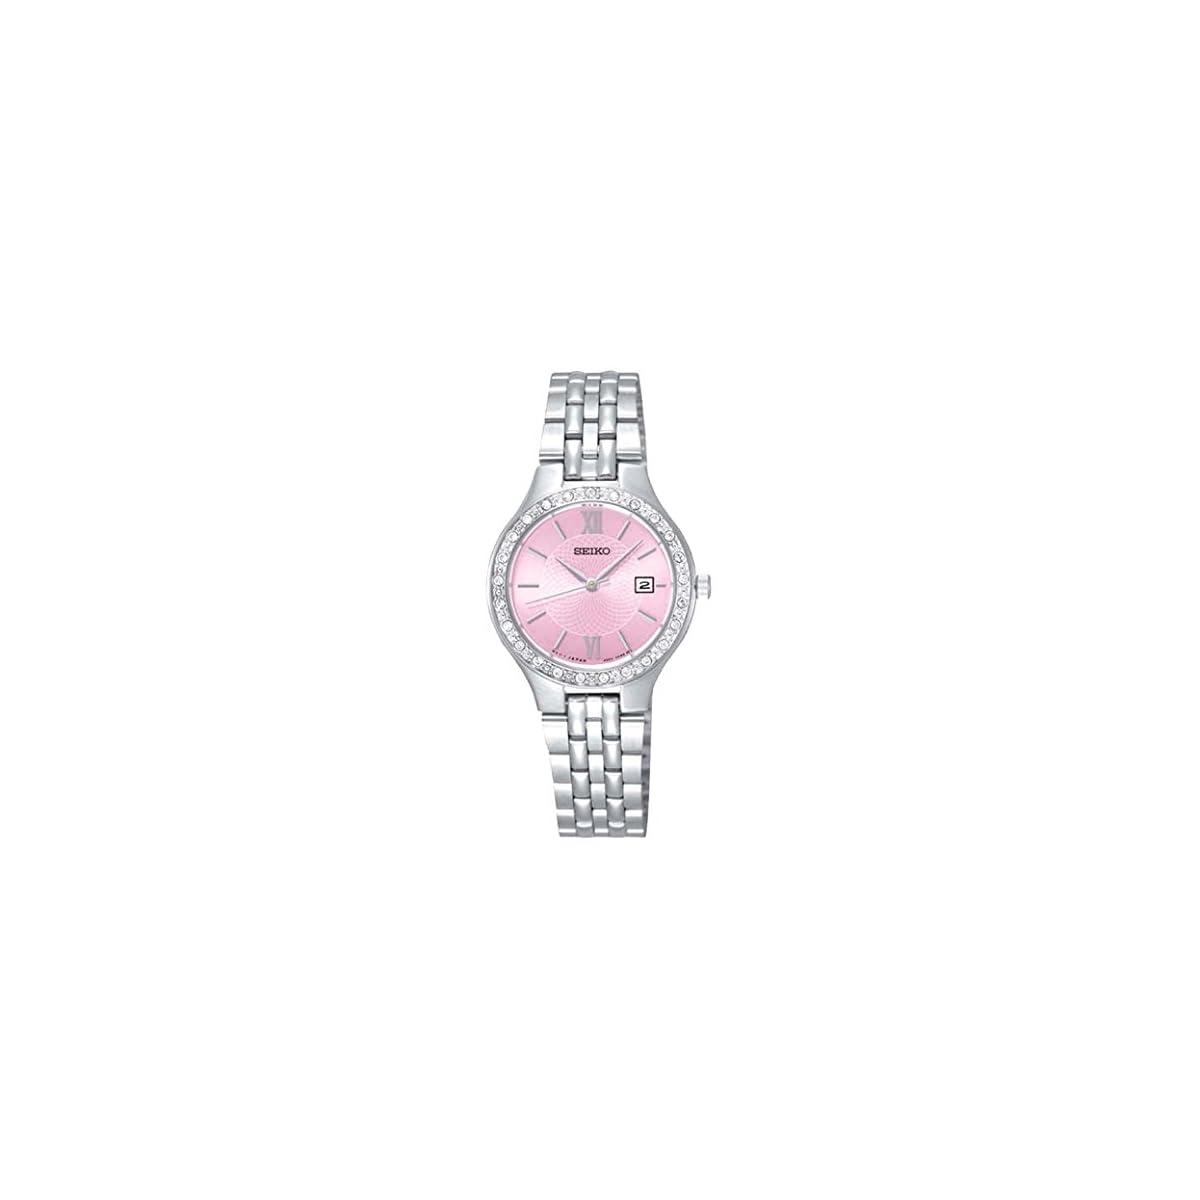 41rxzOr2nkL. SS1200  - Seiko Reloj Analogico para Mujer de Cuarzo con Correa en Acero Inoxidable SUR765P9